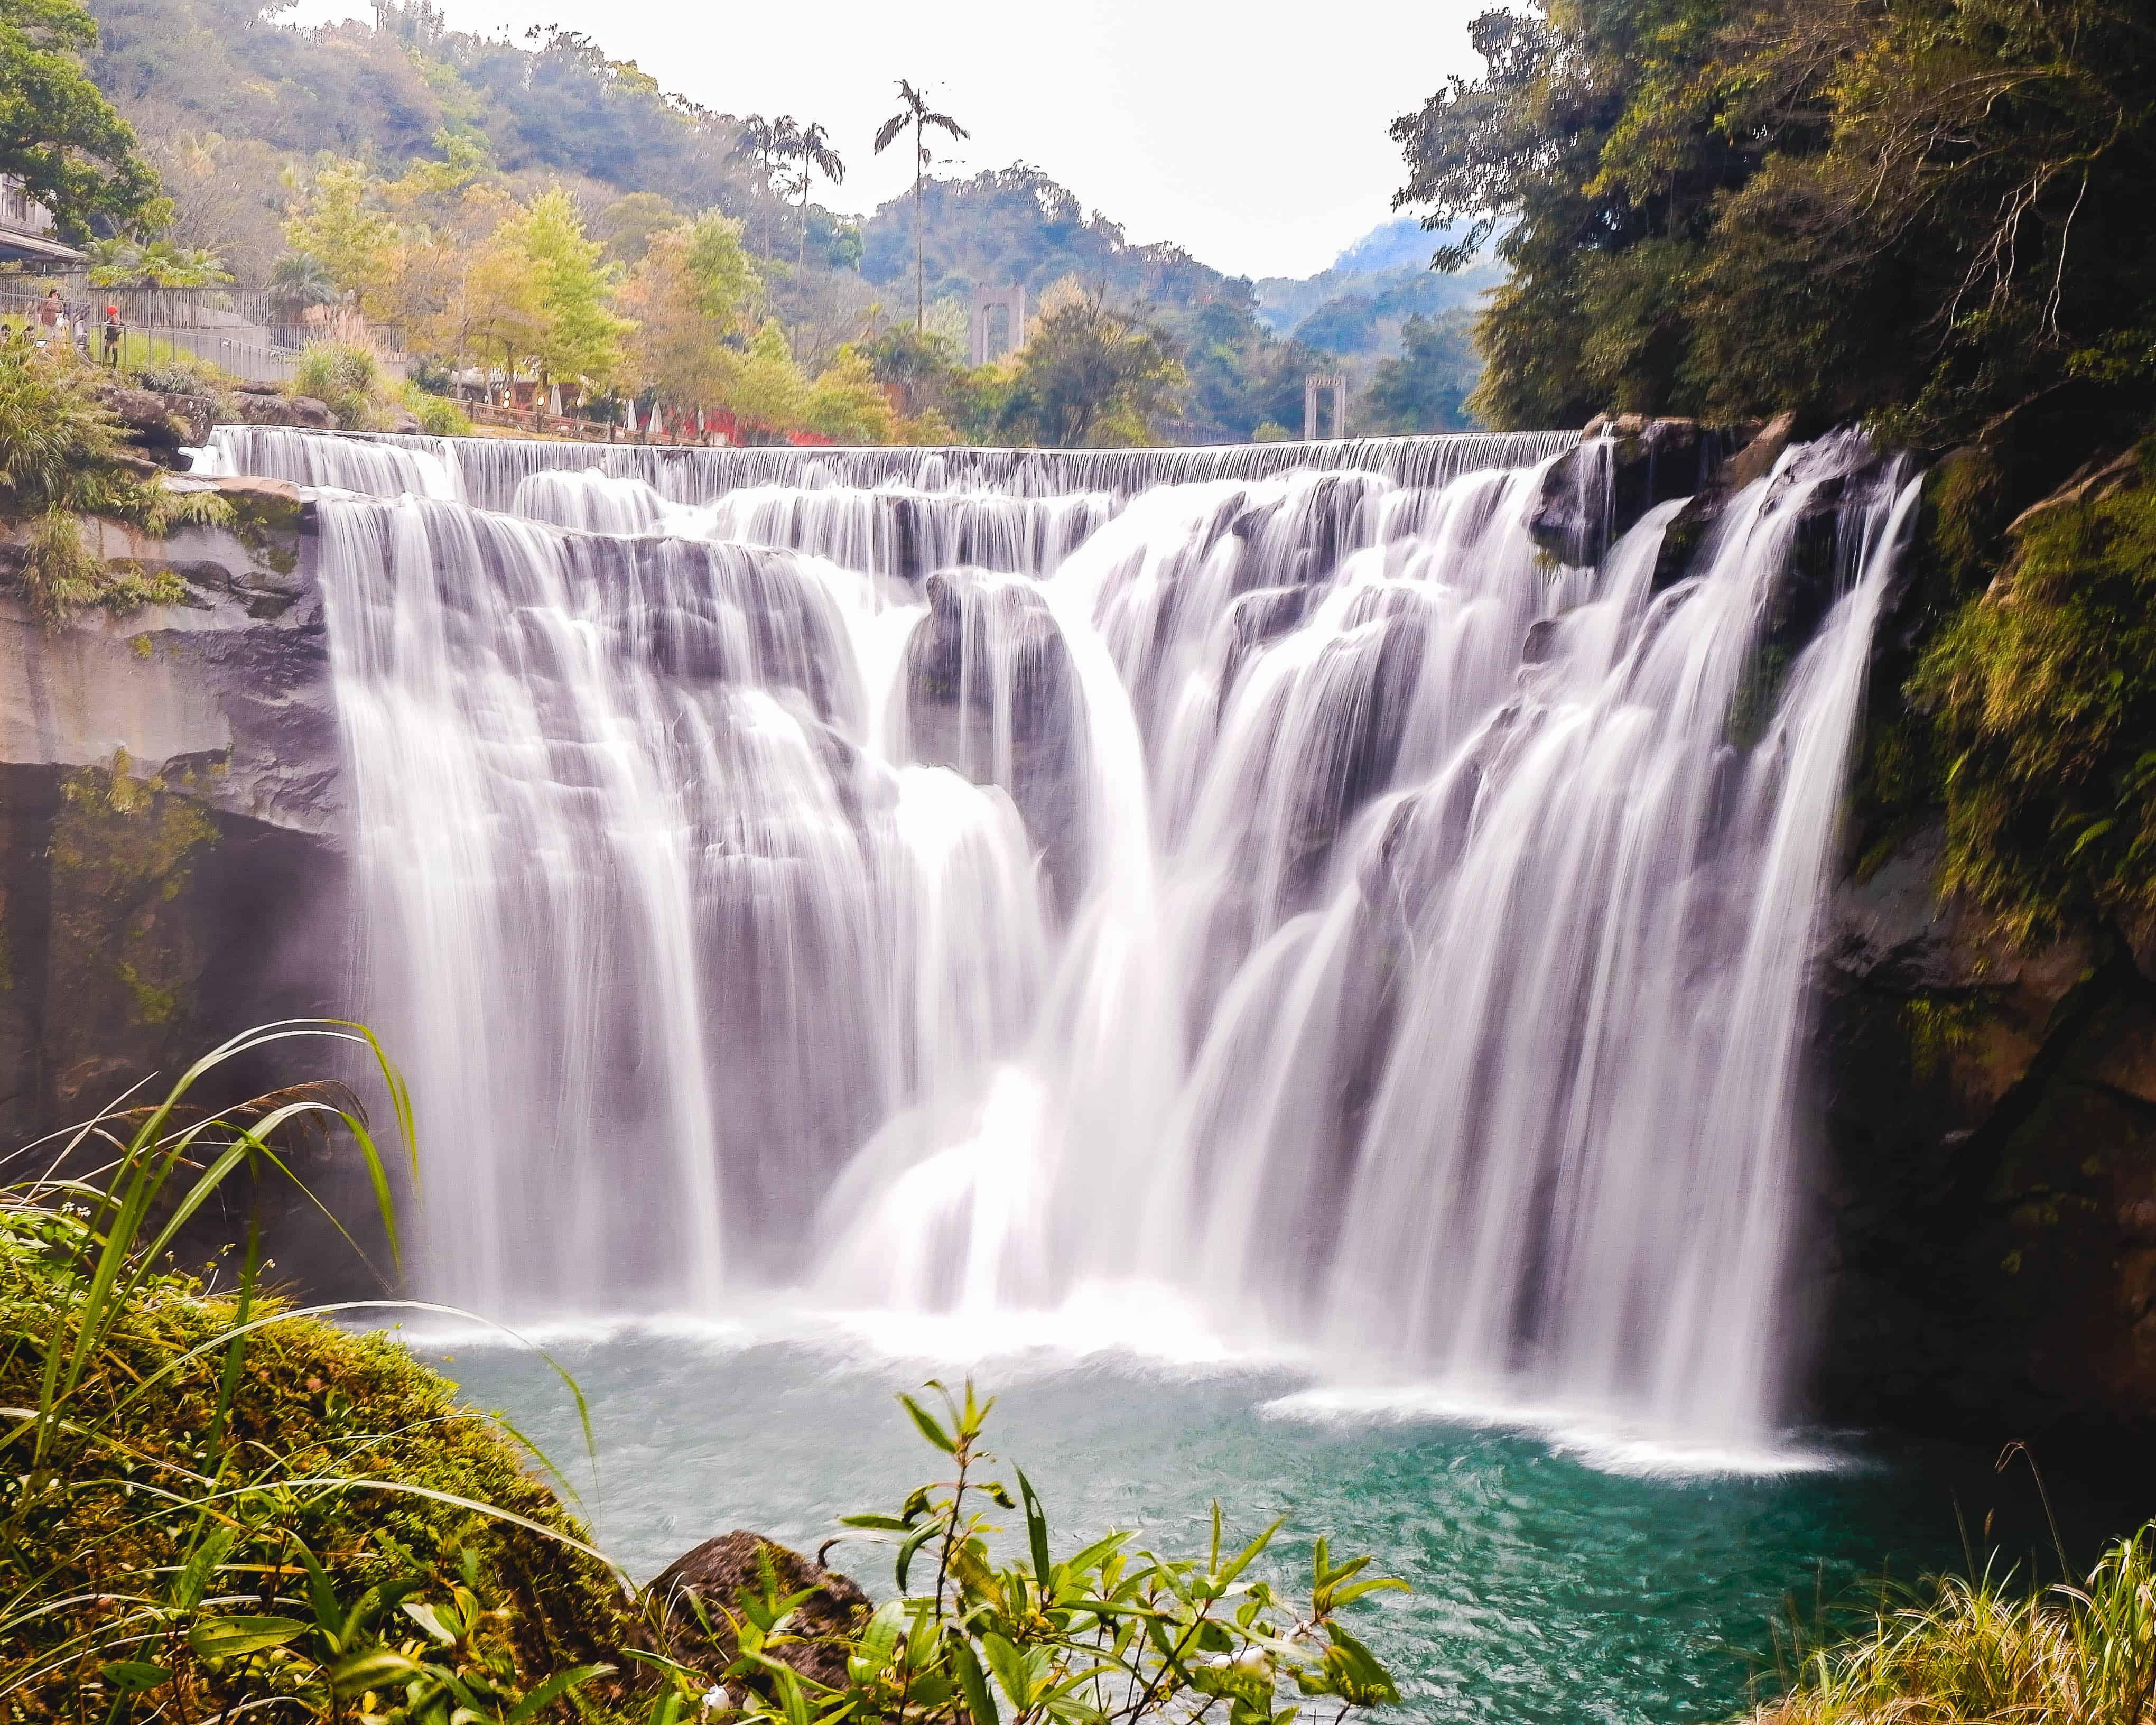 shifen_waterfall_5-day taiwan itinerary